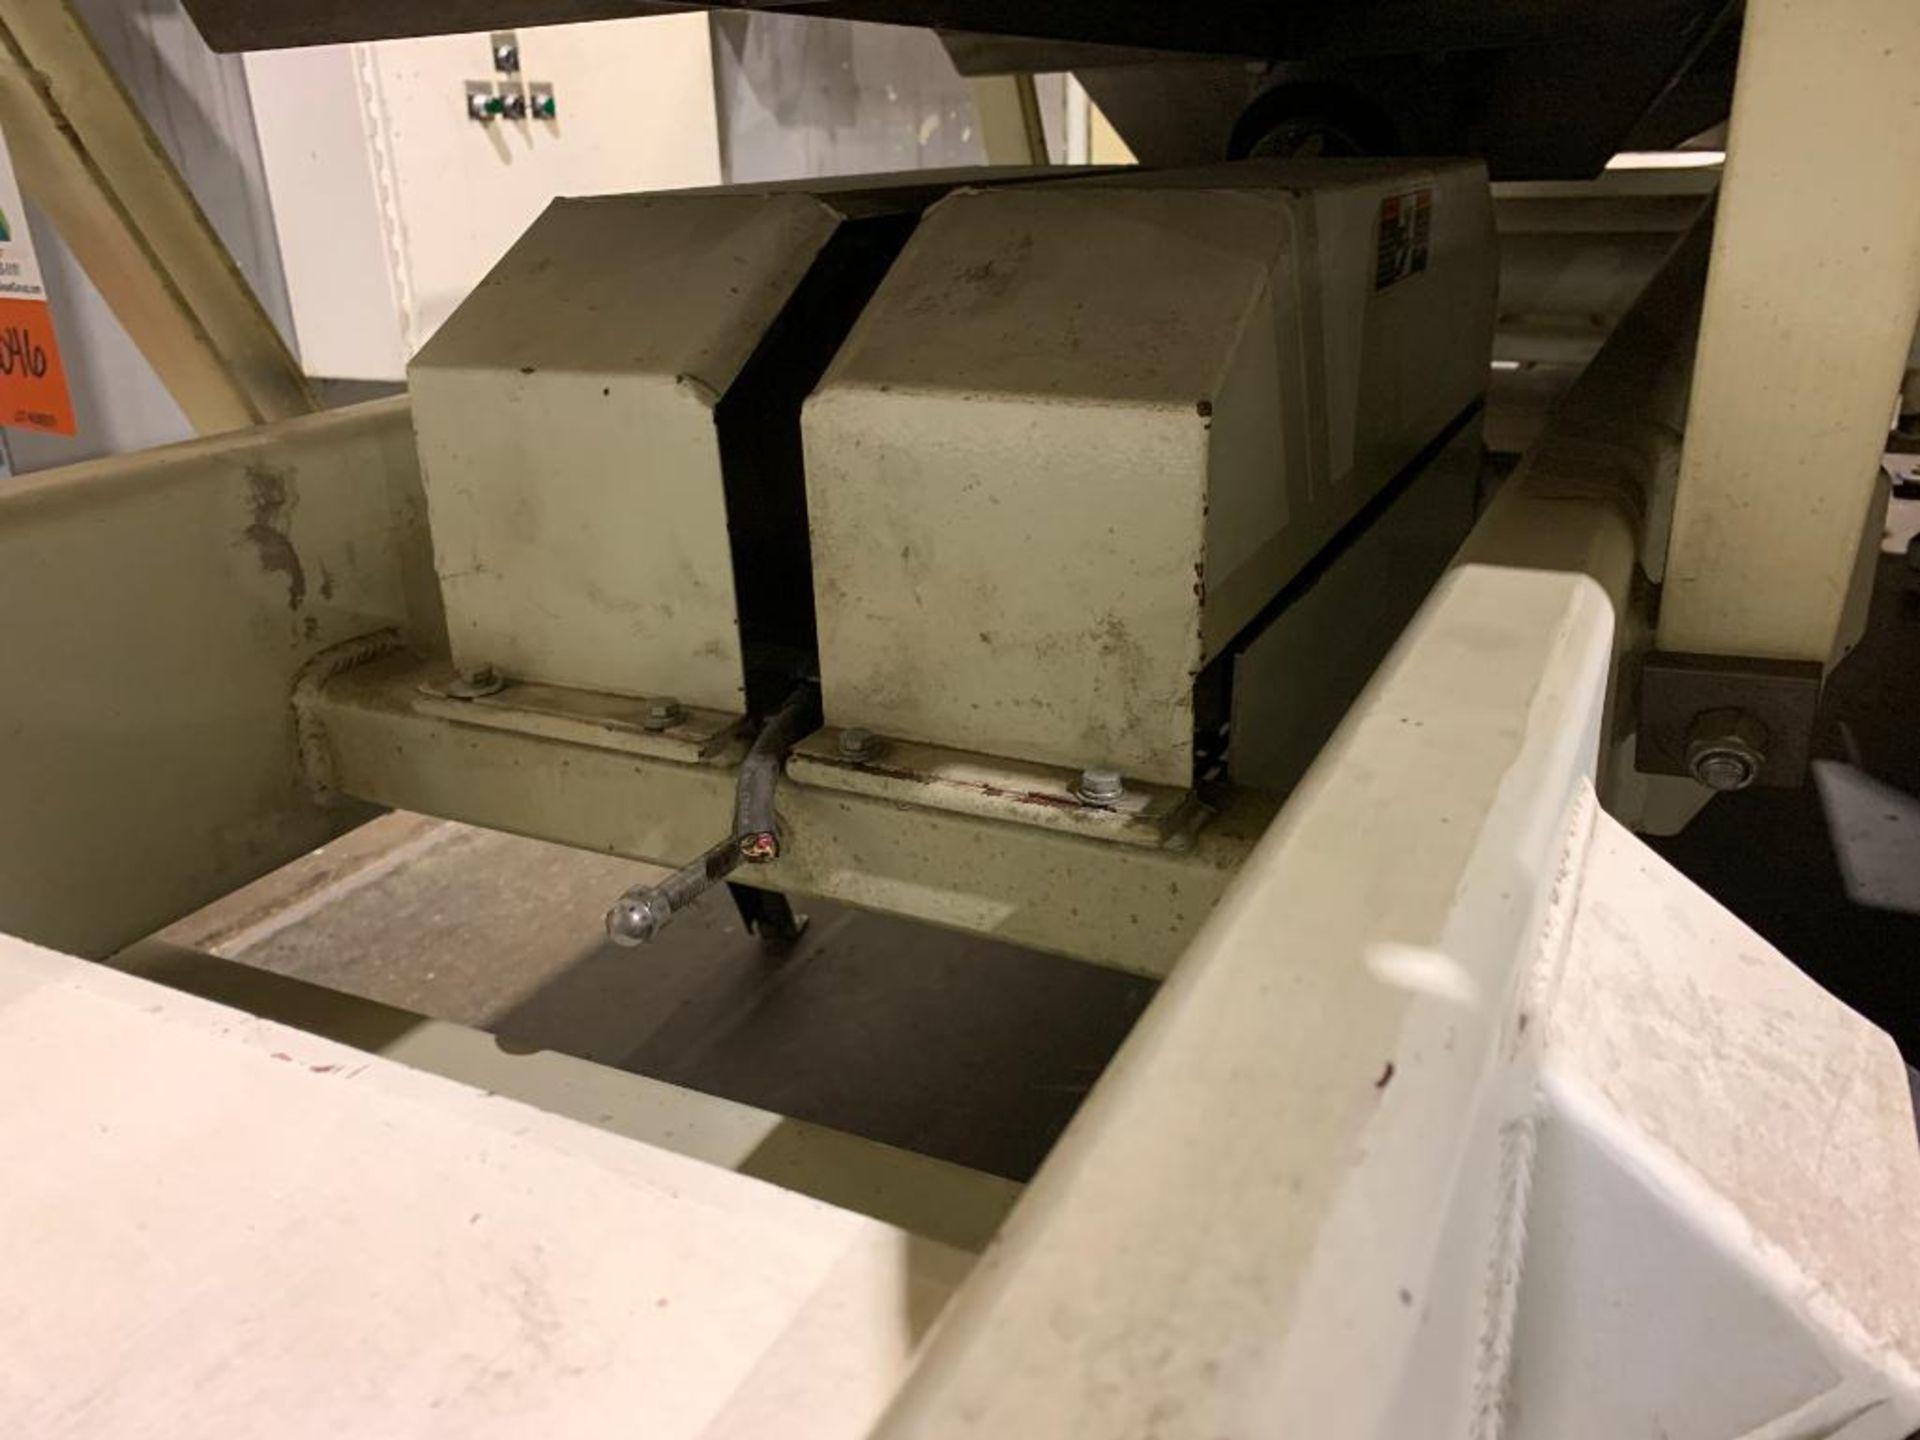 1992 Link-Belt vibratory conveyor, model LBL2405-10X12-10 - Image 31 of 34